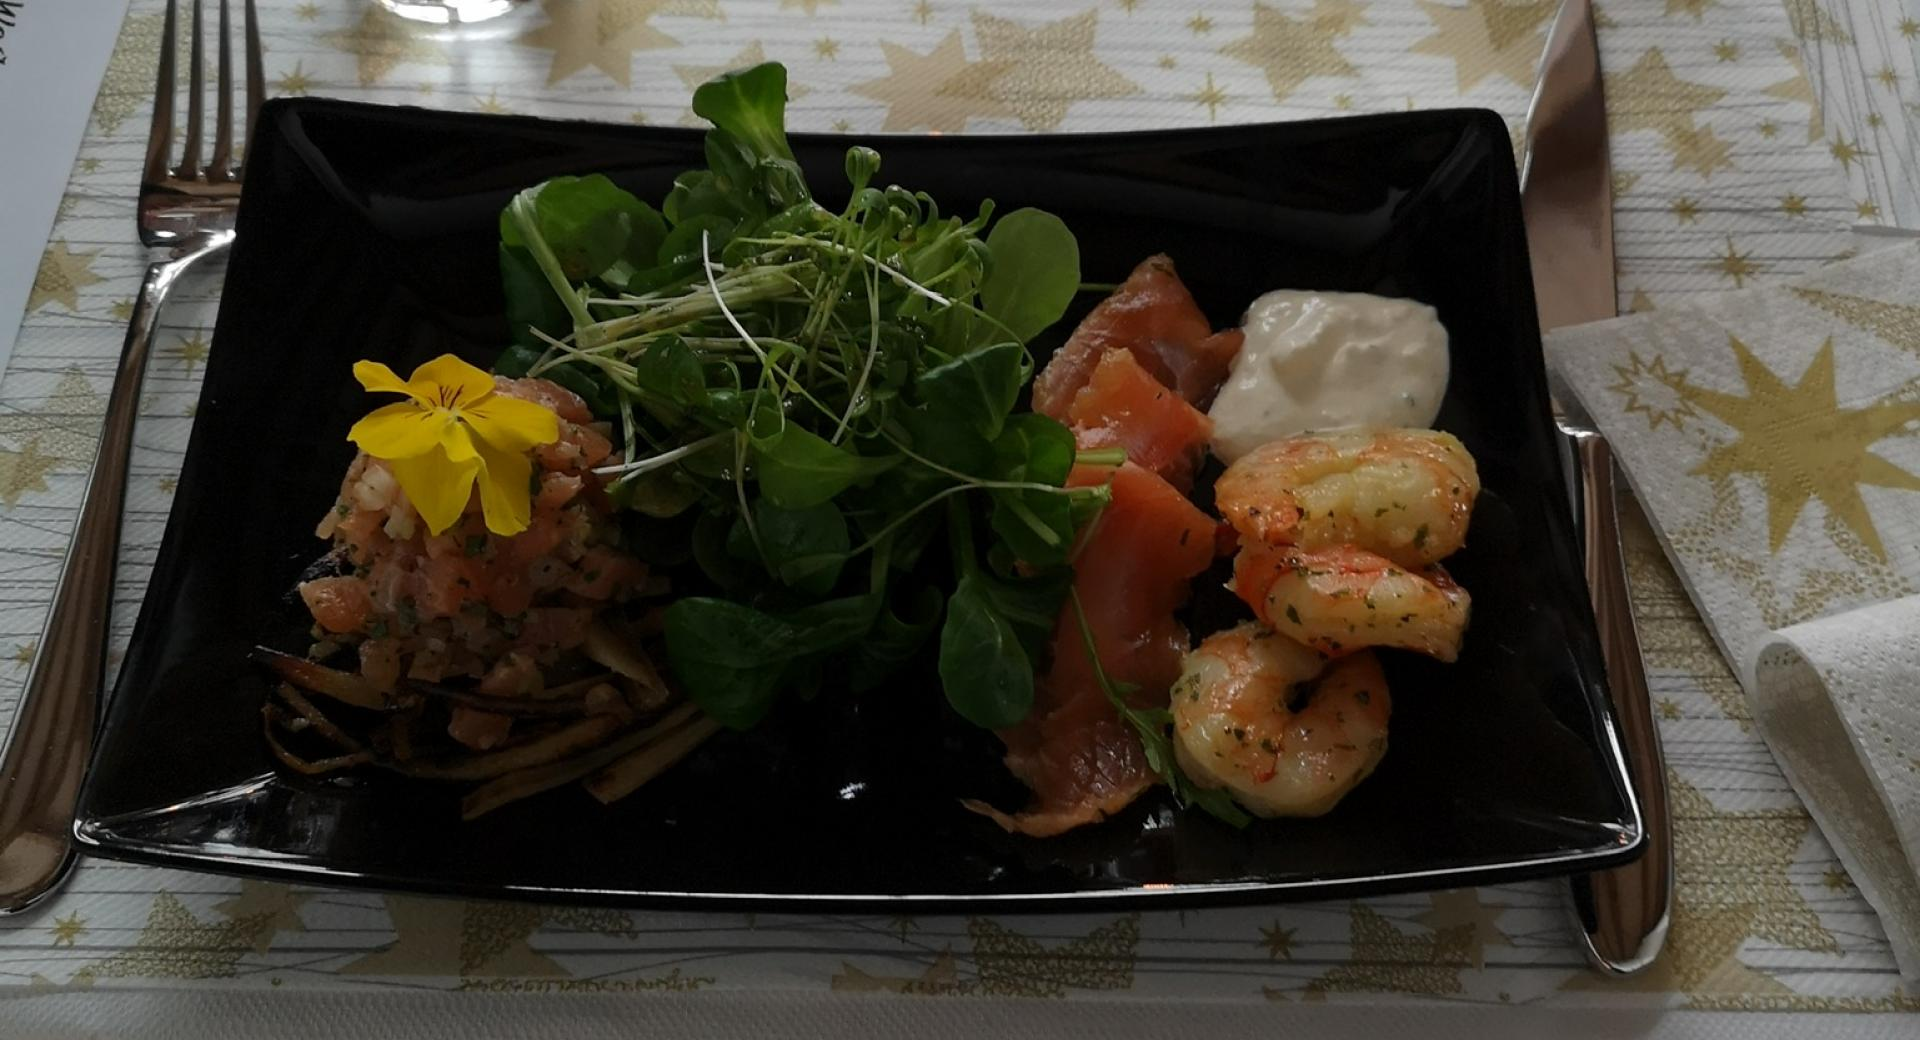 Marinierter Lachs, geräuchtes Forellentatar & grillierte Crevetten mit Wildkräutersalat